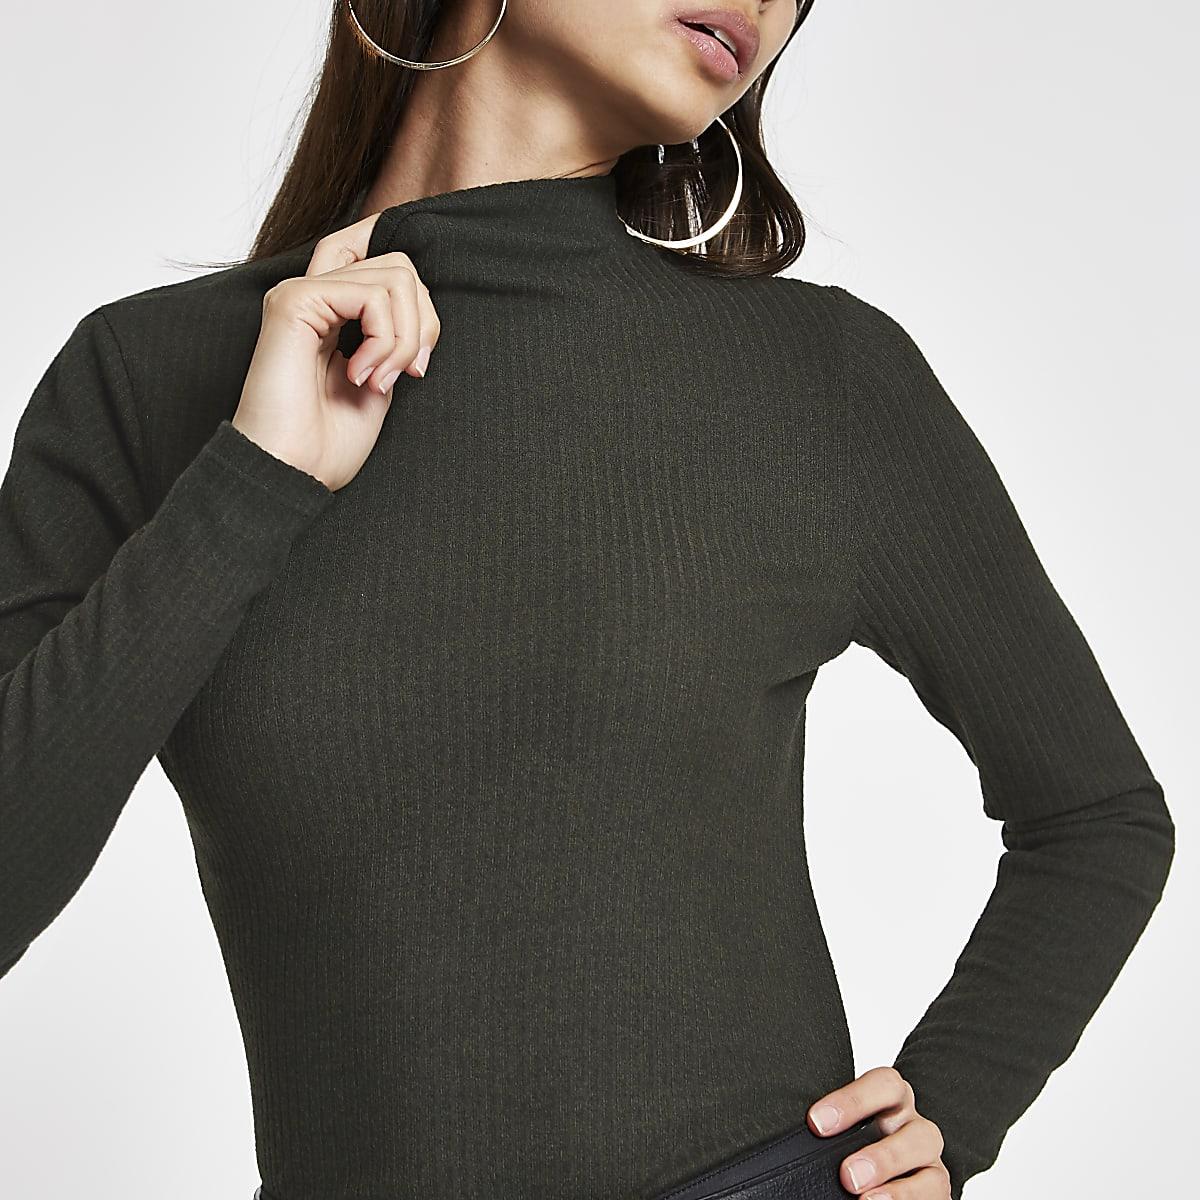 Khaki brushed ribbed high neck top